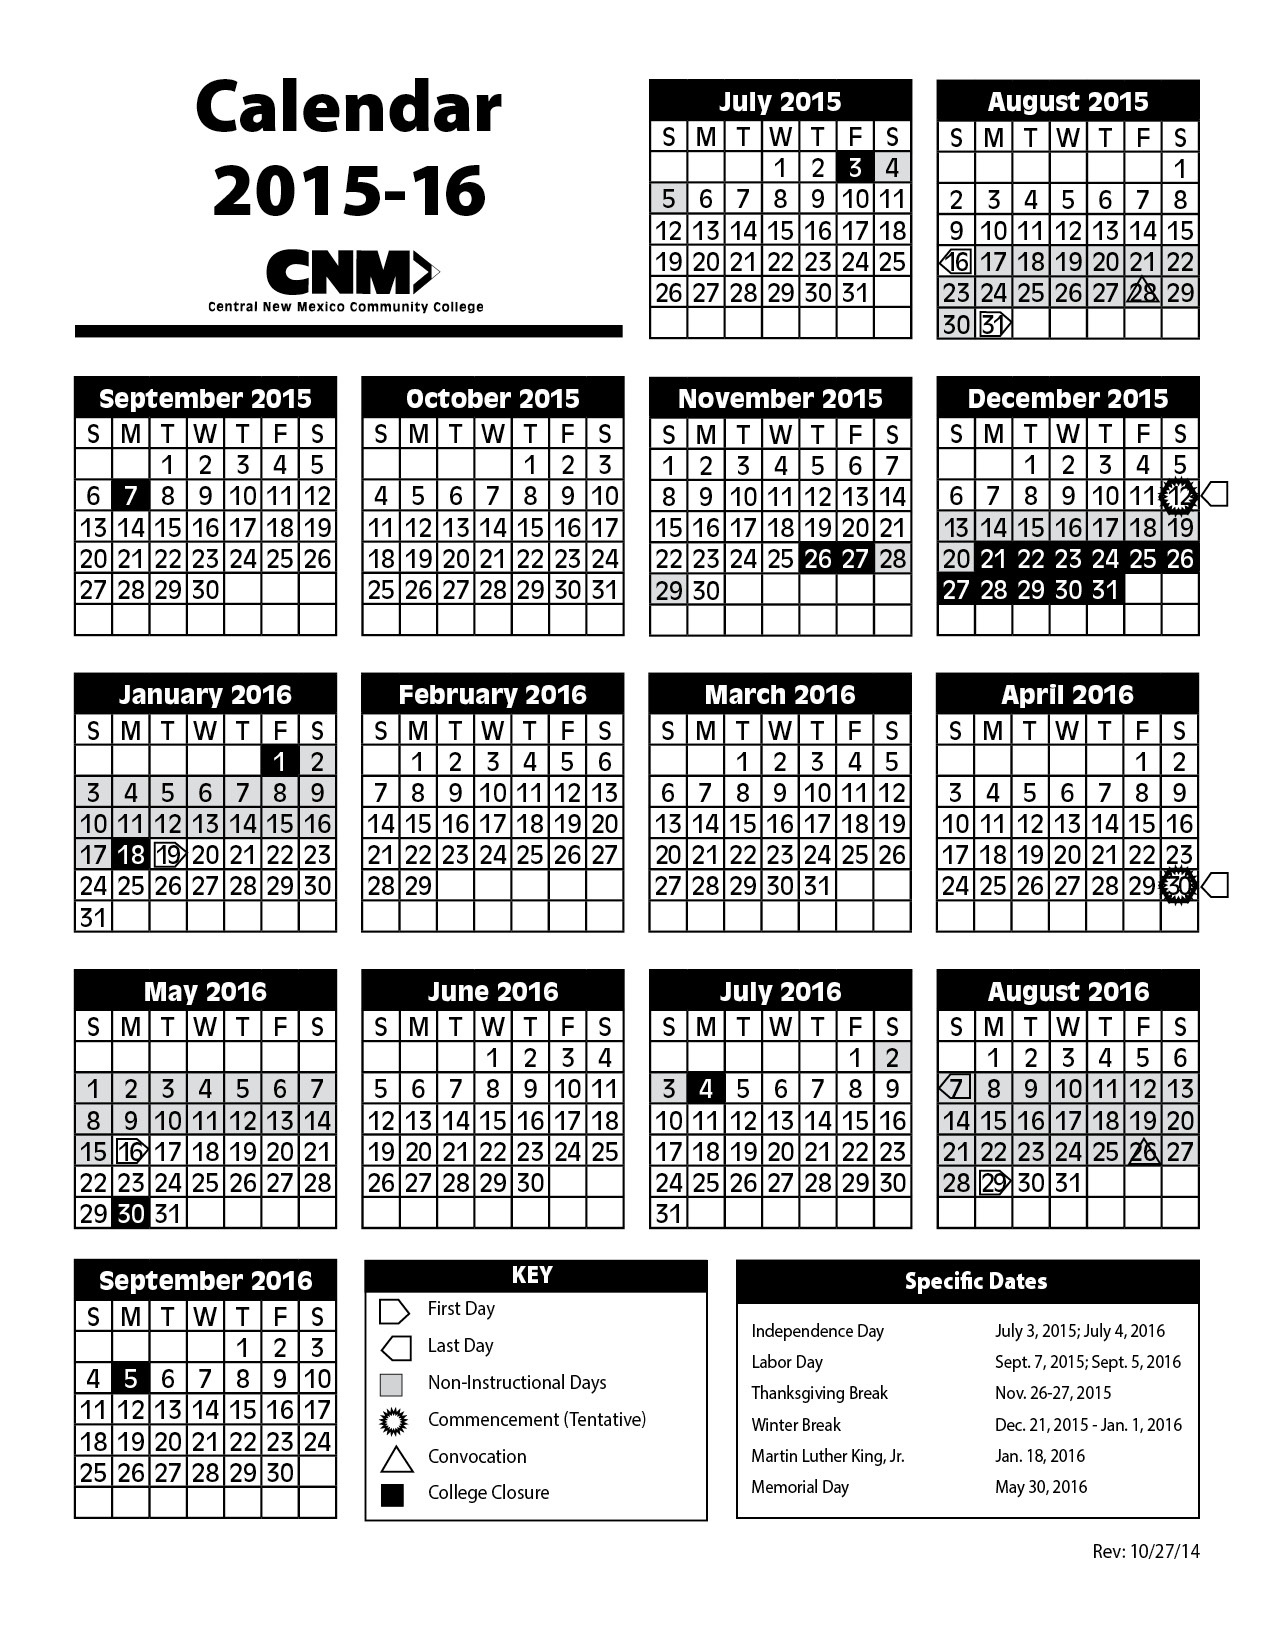 caption:2015-16 Academic Calendar thumbnail